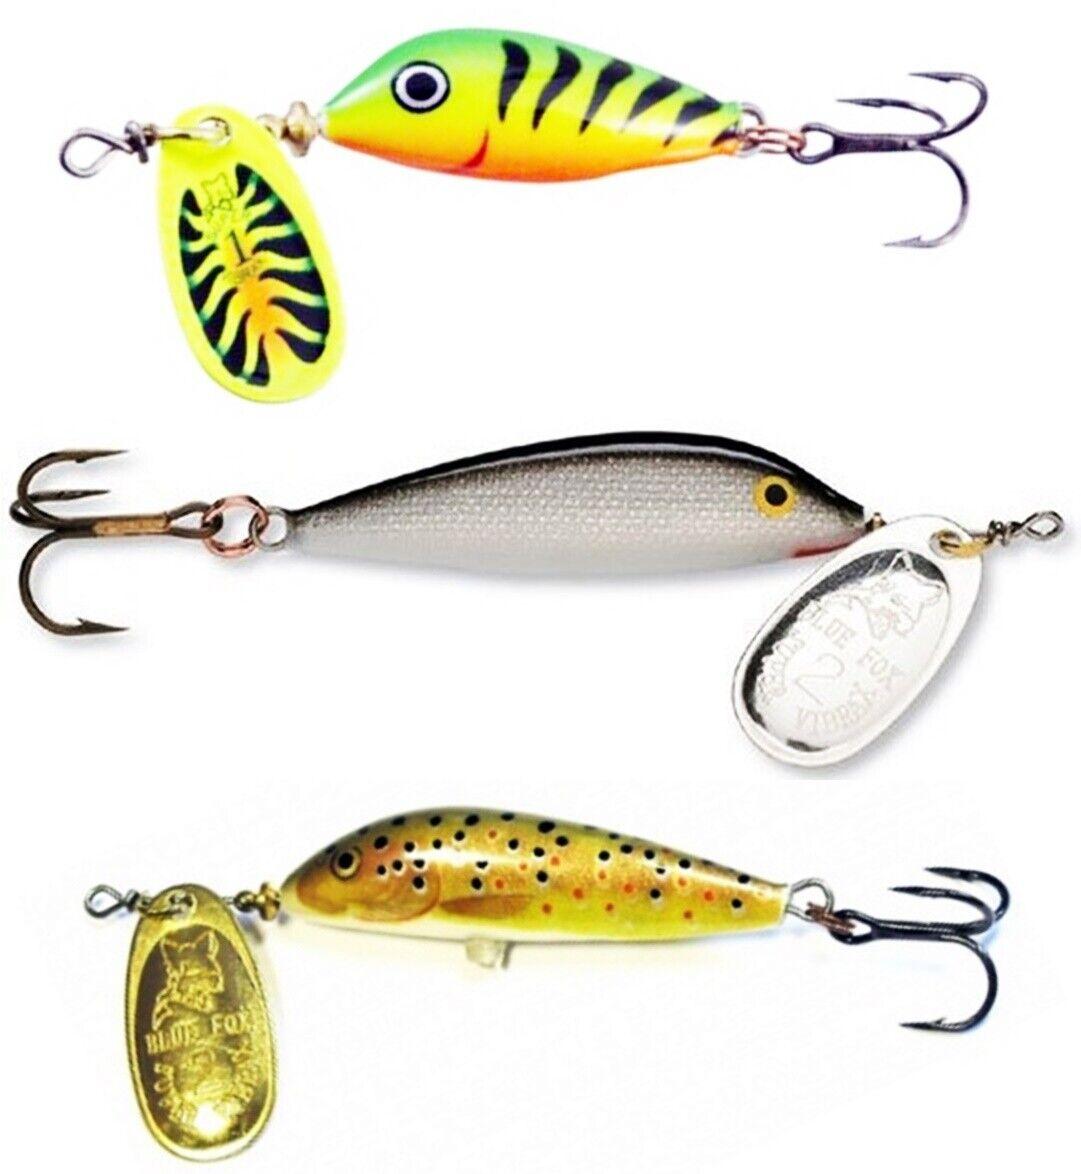 Panfish Trout Bass Lures NIB 3 Blue Fox Vibrax Minnow Spin VMS3 S//RT//MN 3//16 oz